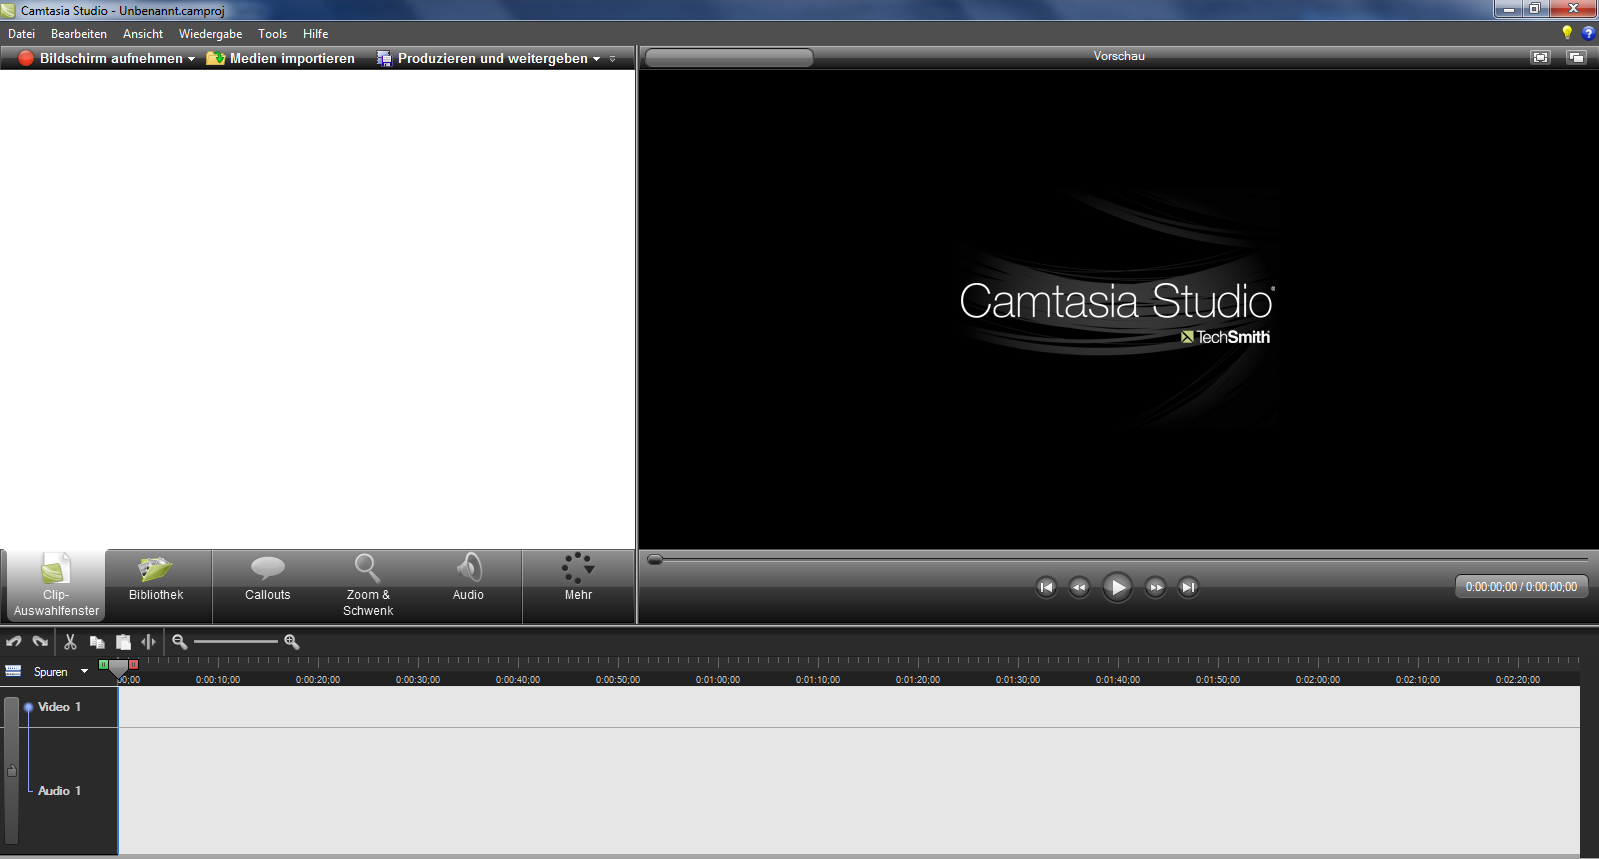 camtasia studio 7.1 1 key